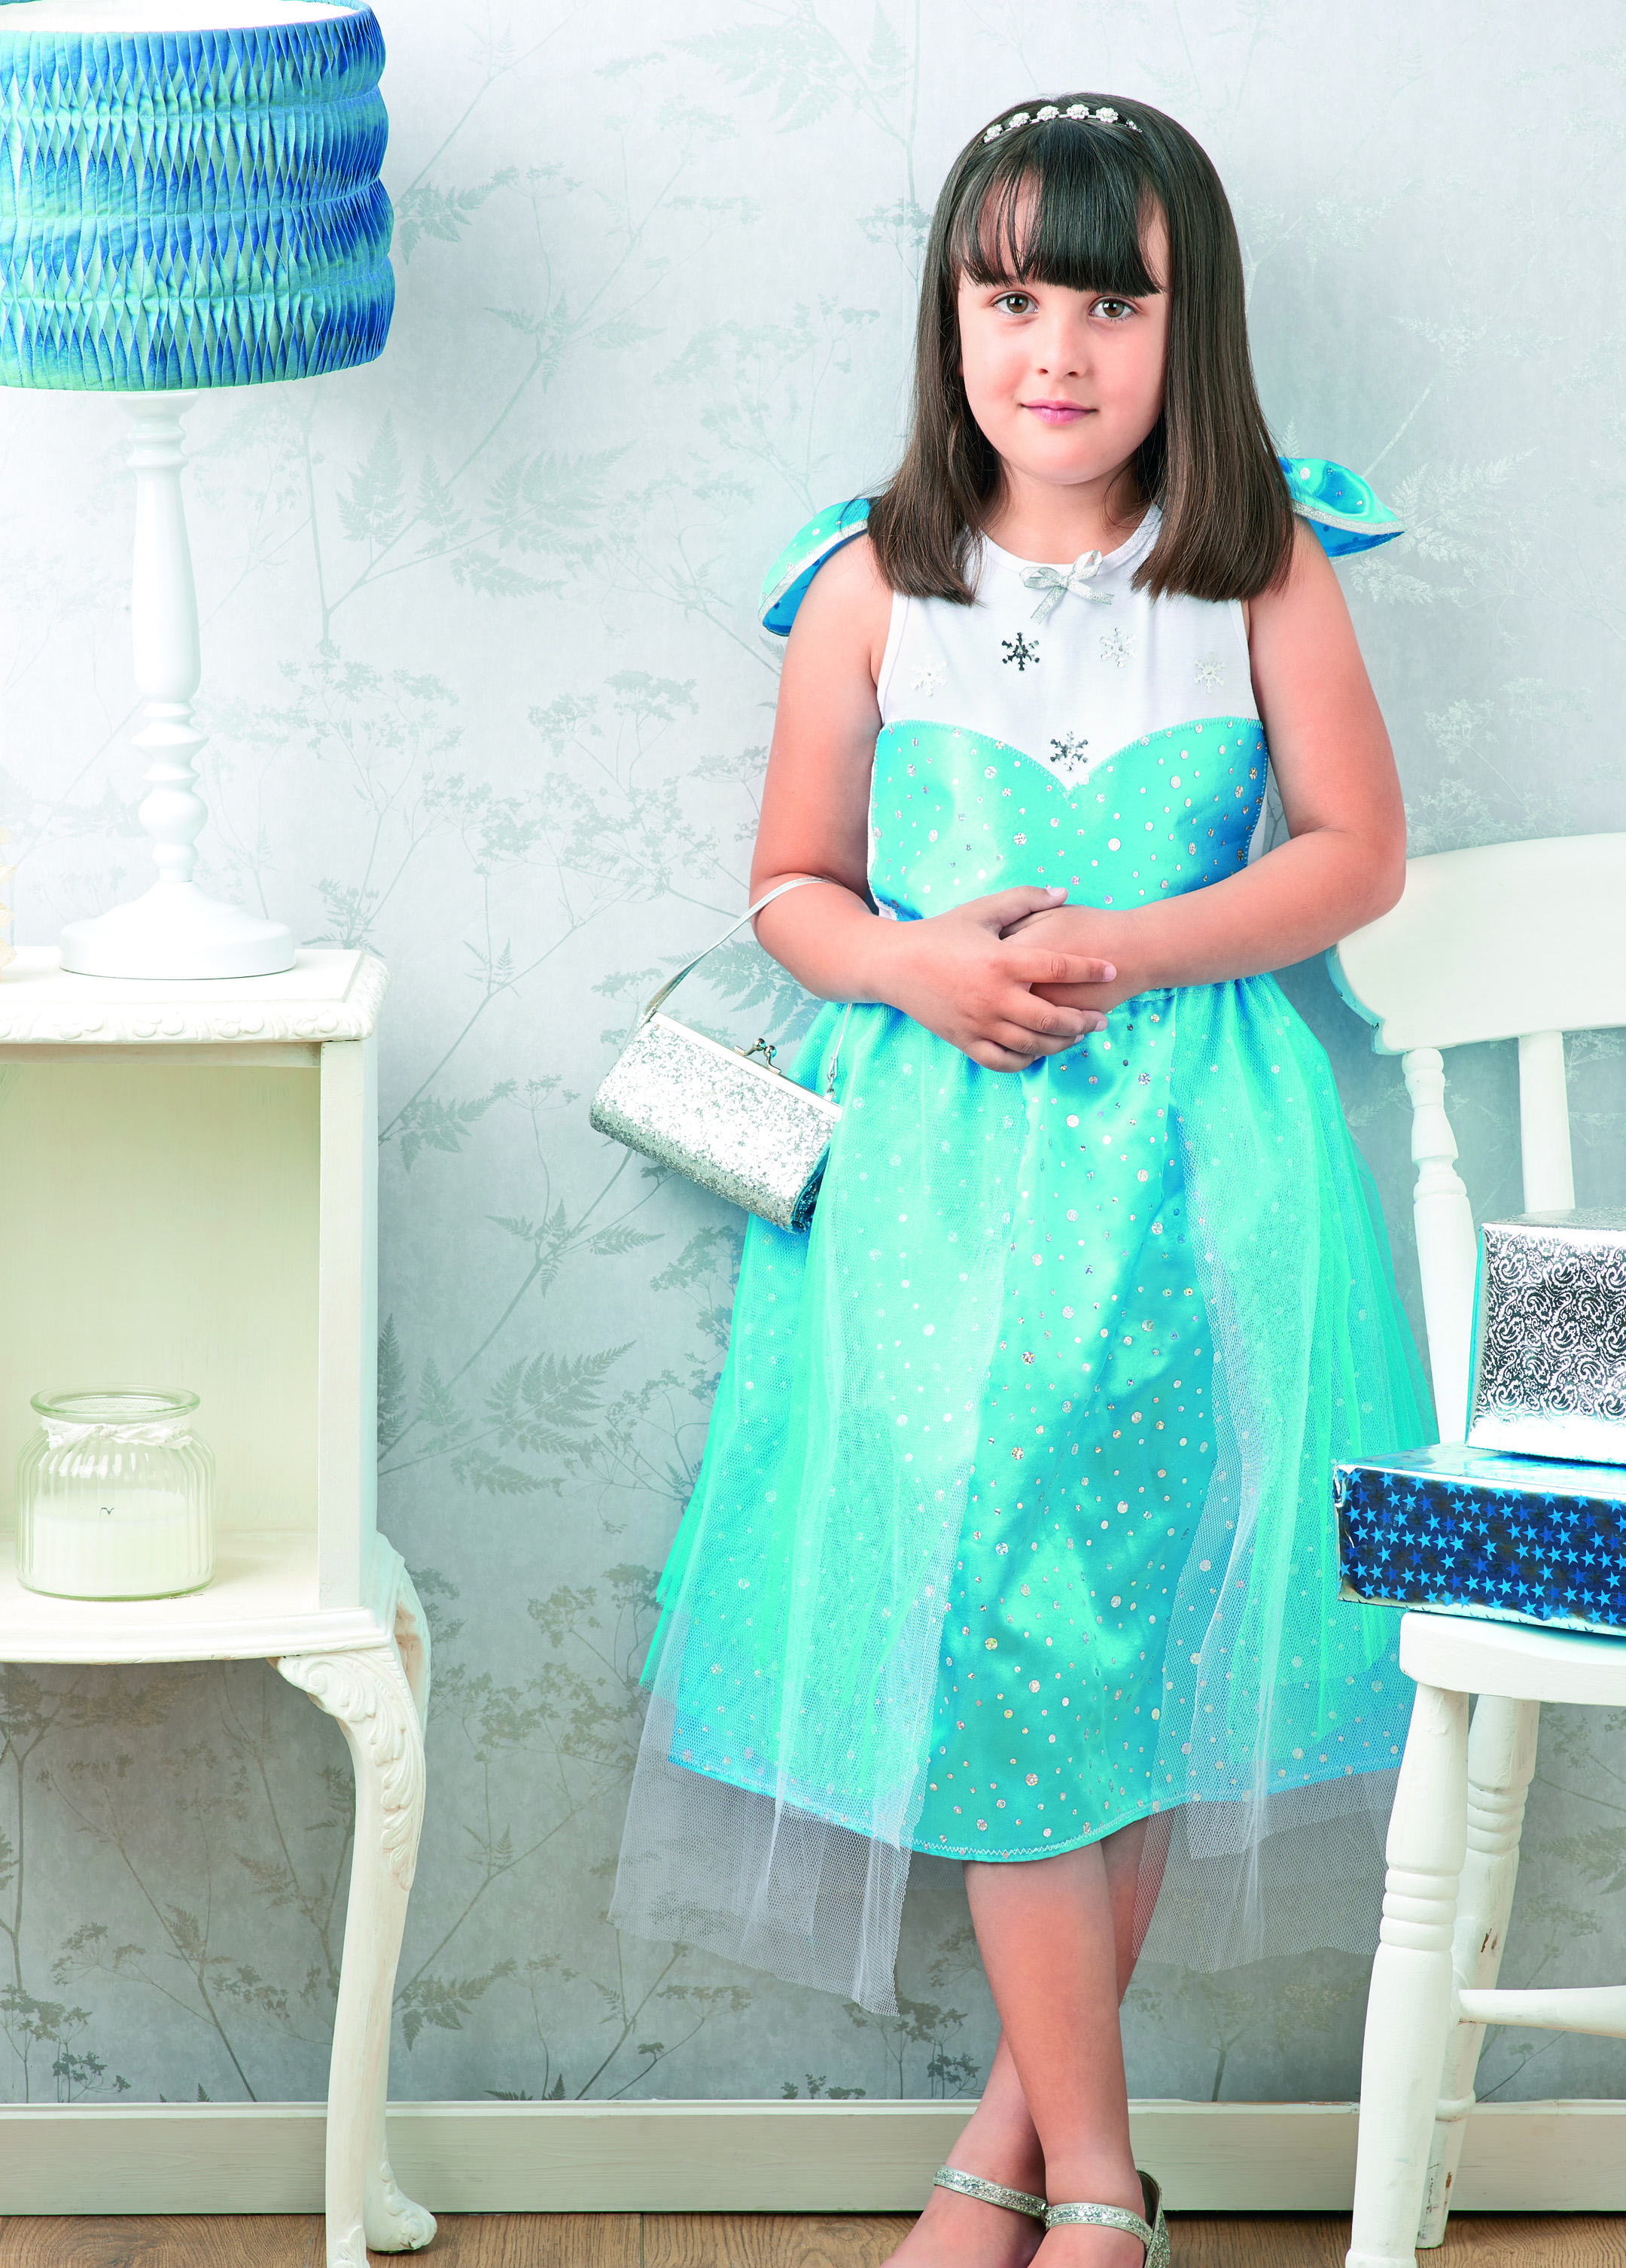 princess costume dress free sewing patterns sew magazine. Black Bedroom Furniture Sets. Home Design Ideas